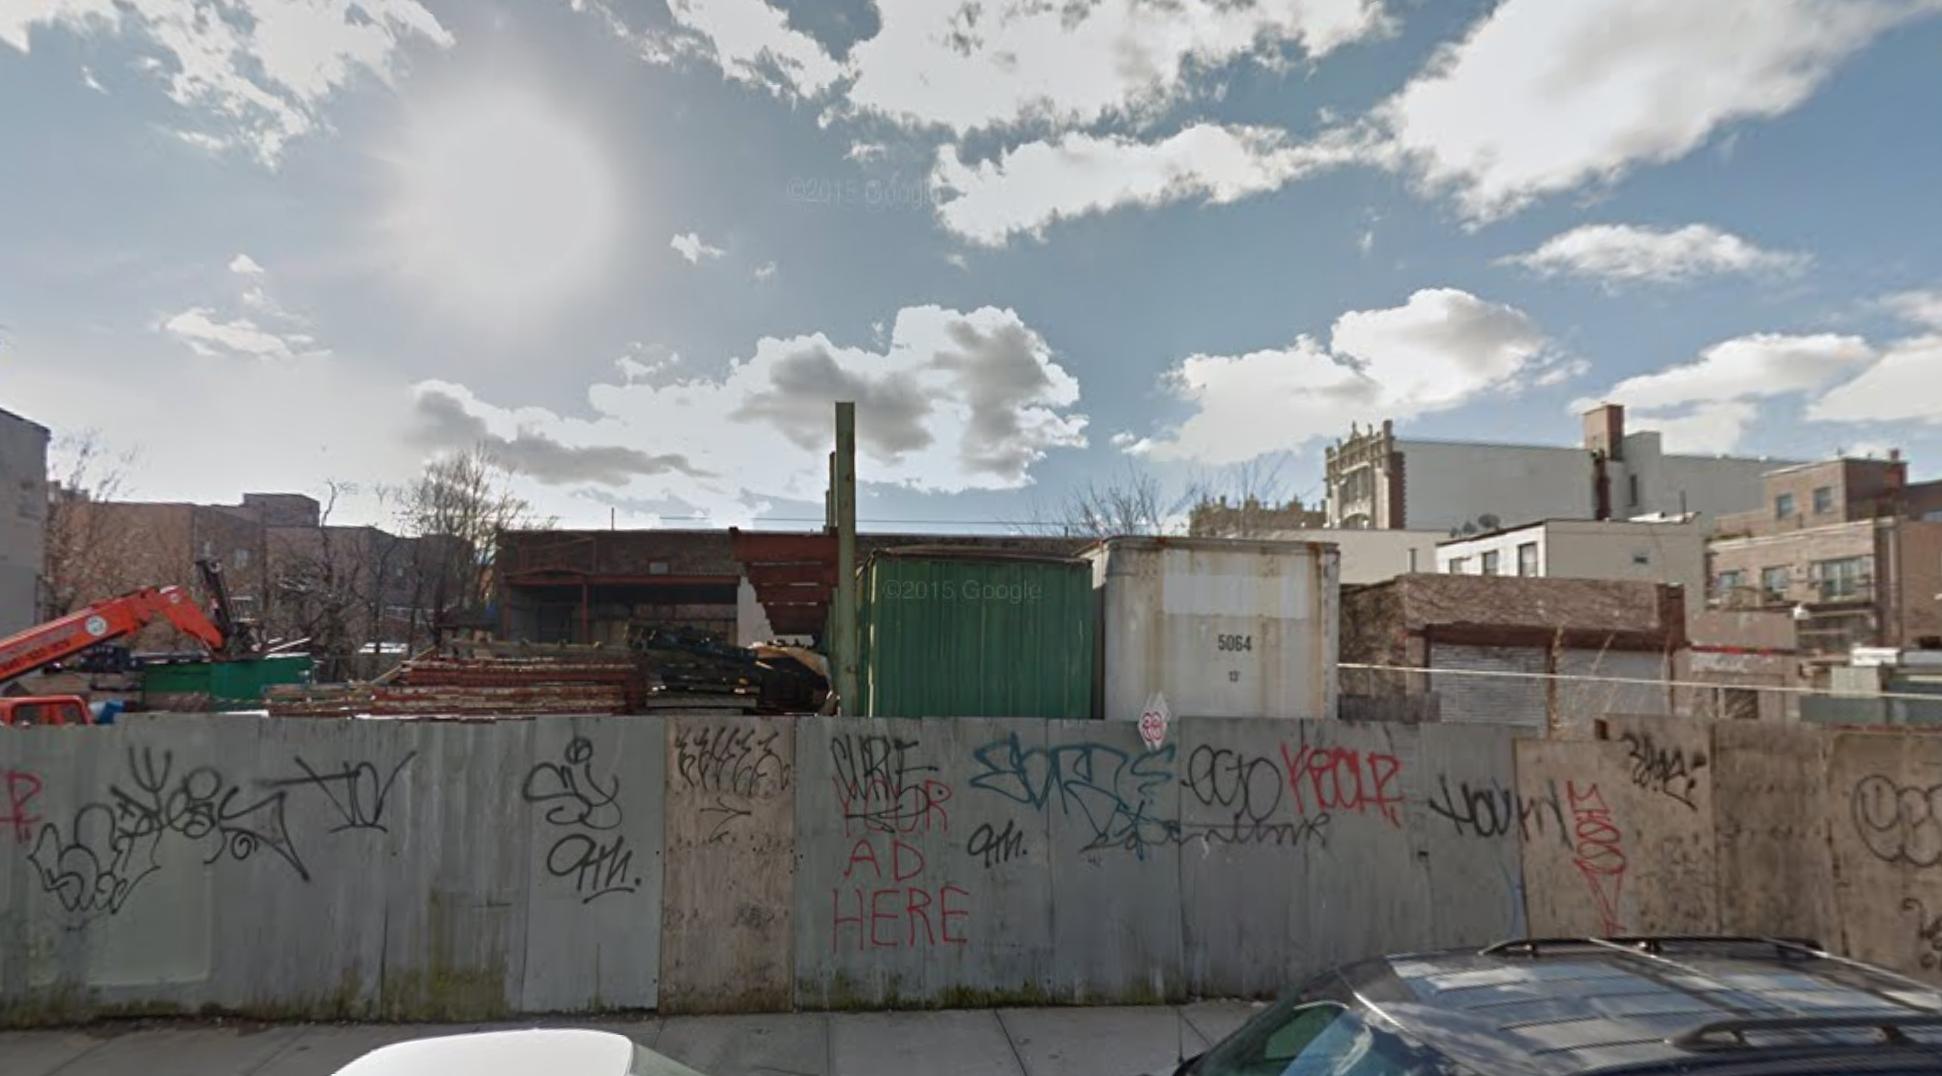 430 Park Avenue, image via Google Maps